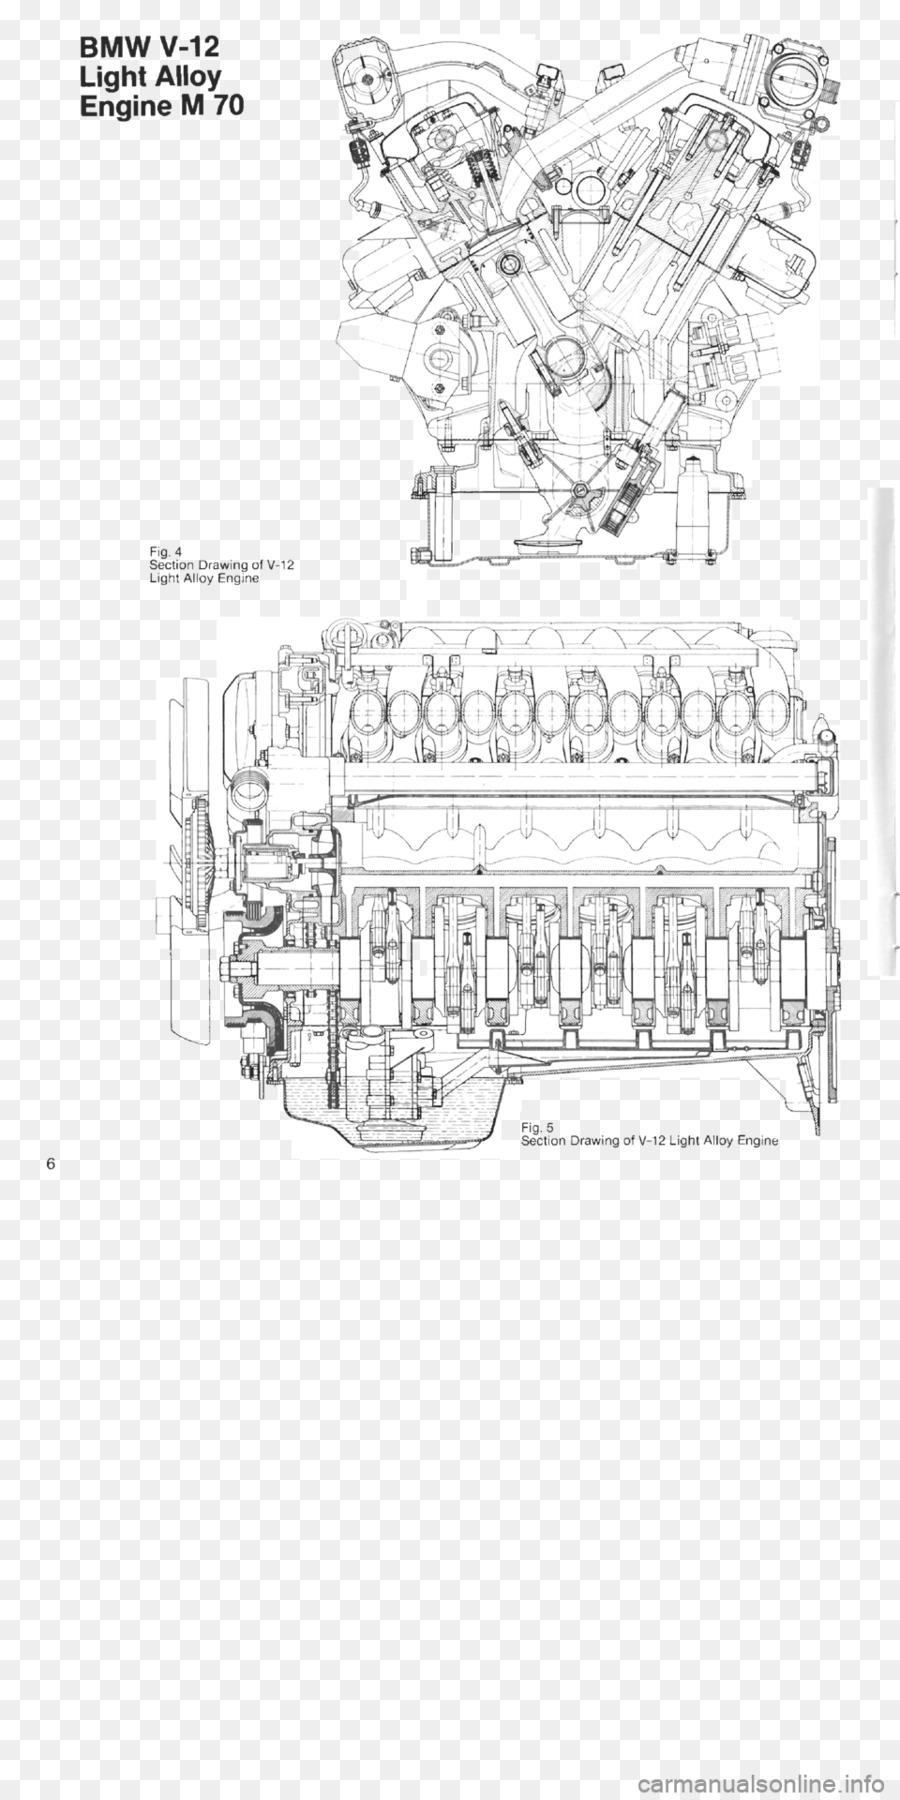 hight resolution of bmw v12 engine diagram wiring diagram mega bmw v12 engine diagram